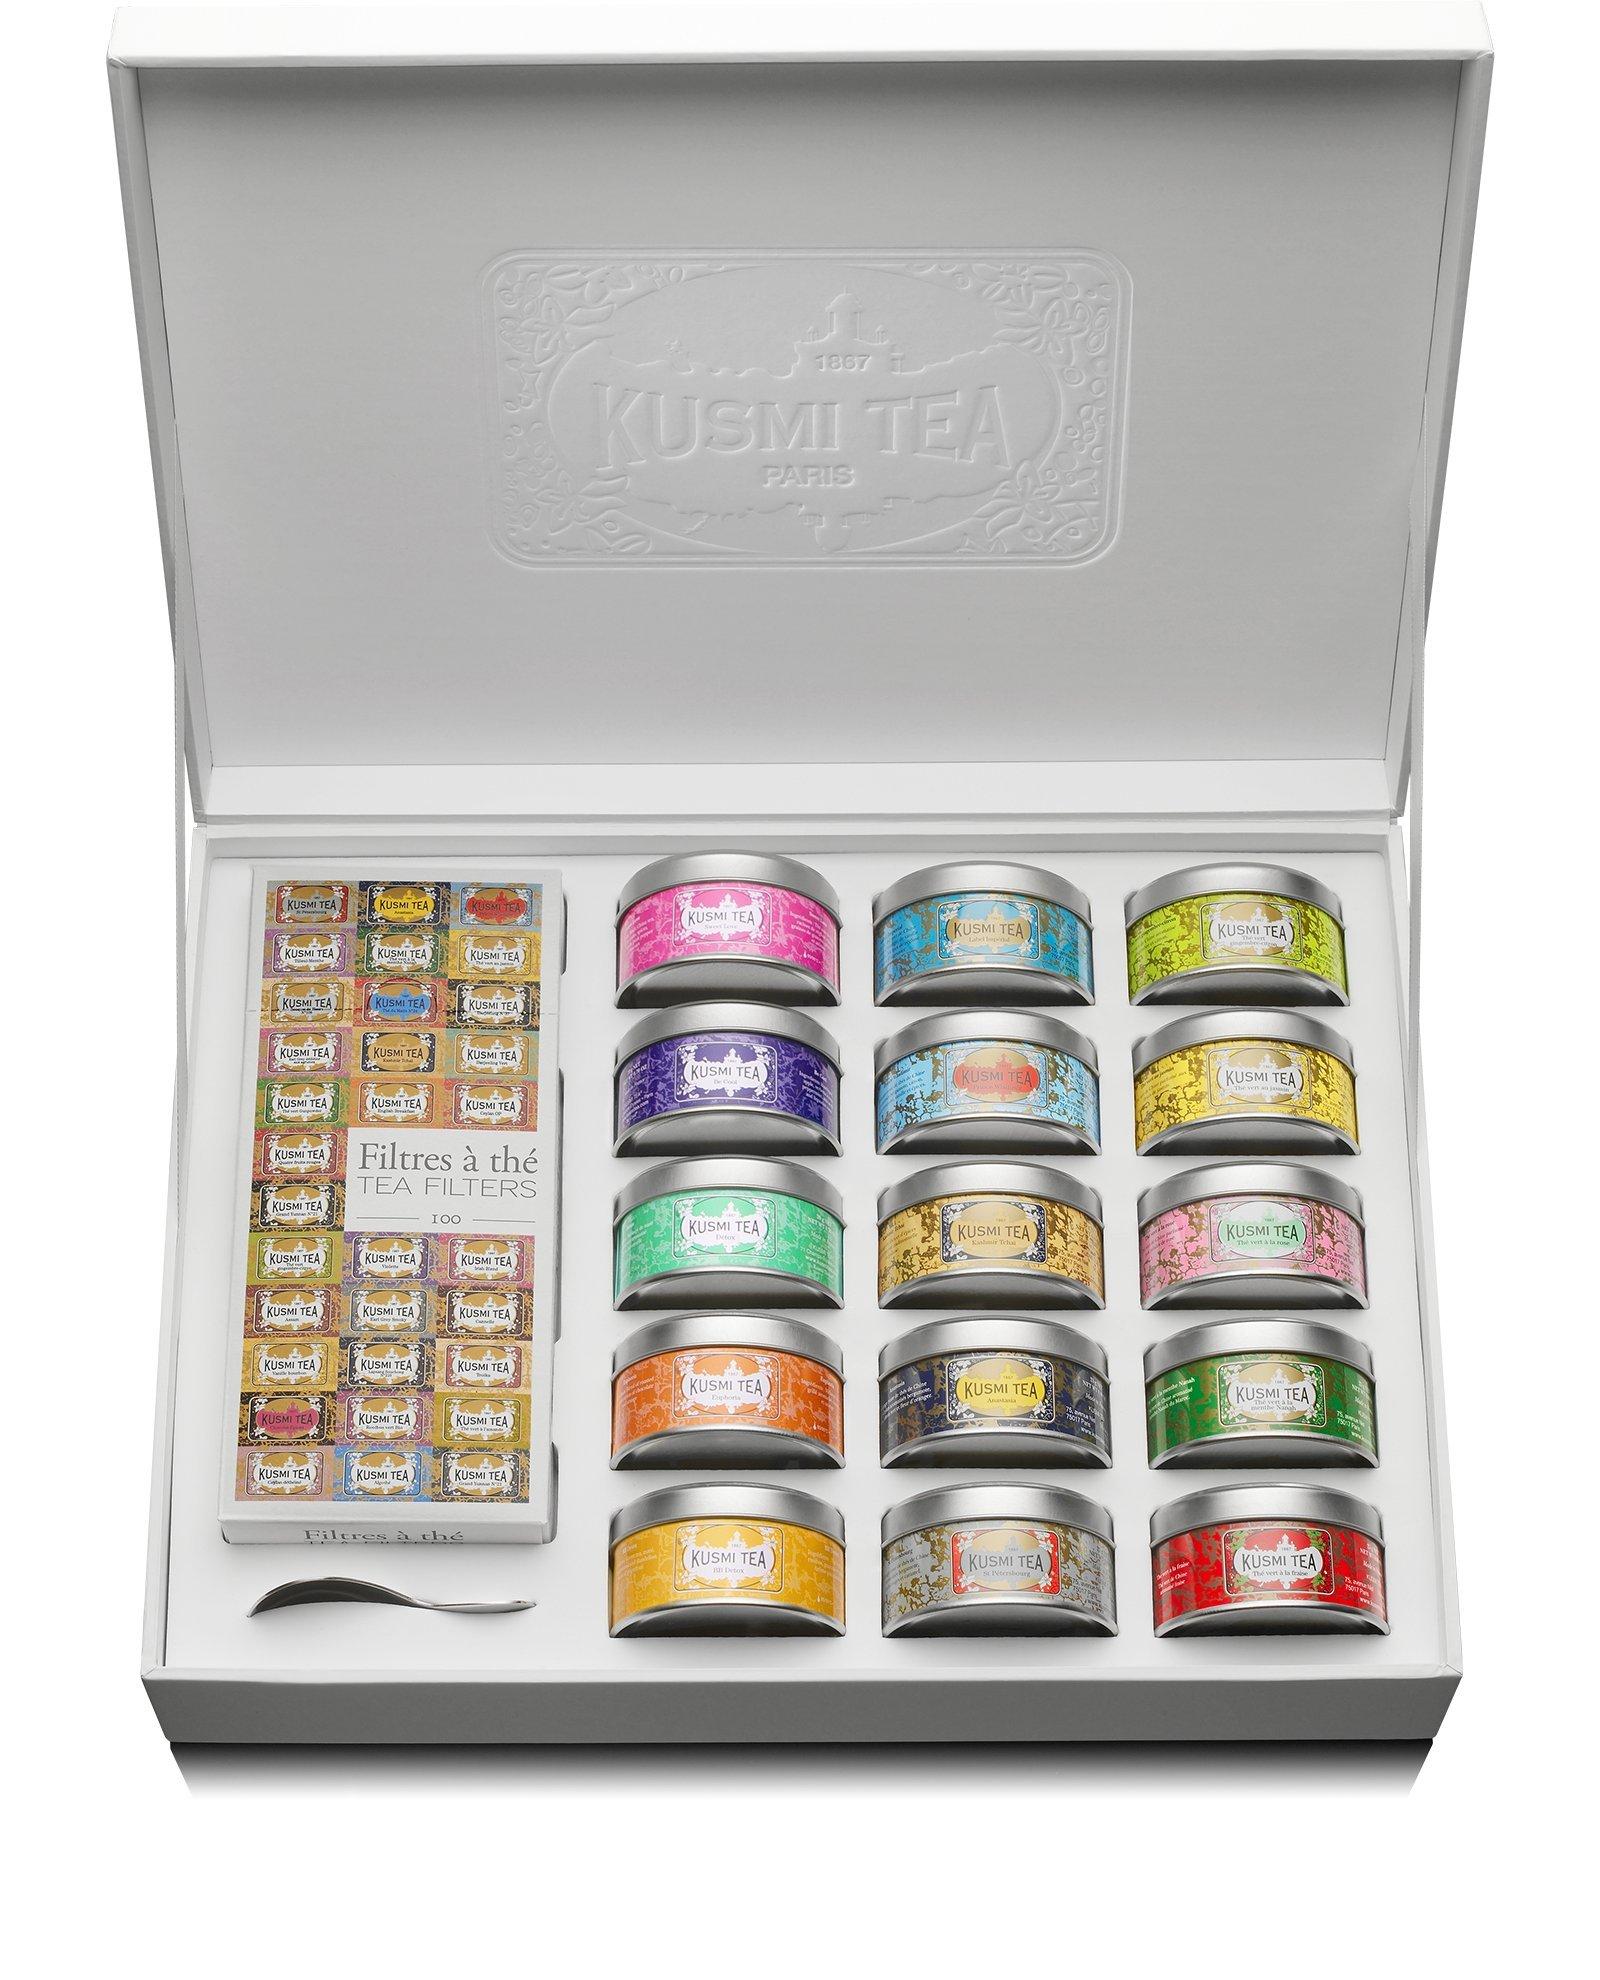 Kusmi Tea - Premium Collection - 15 tins of loose leaf flavored teas sampler and infuser - Perfect Tea Gift Set by KUSMI TEA (Image #1)